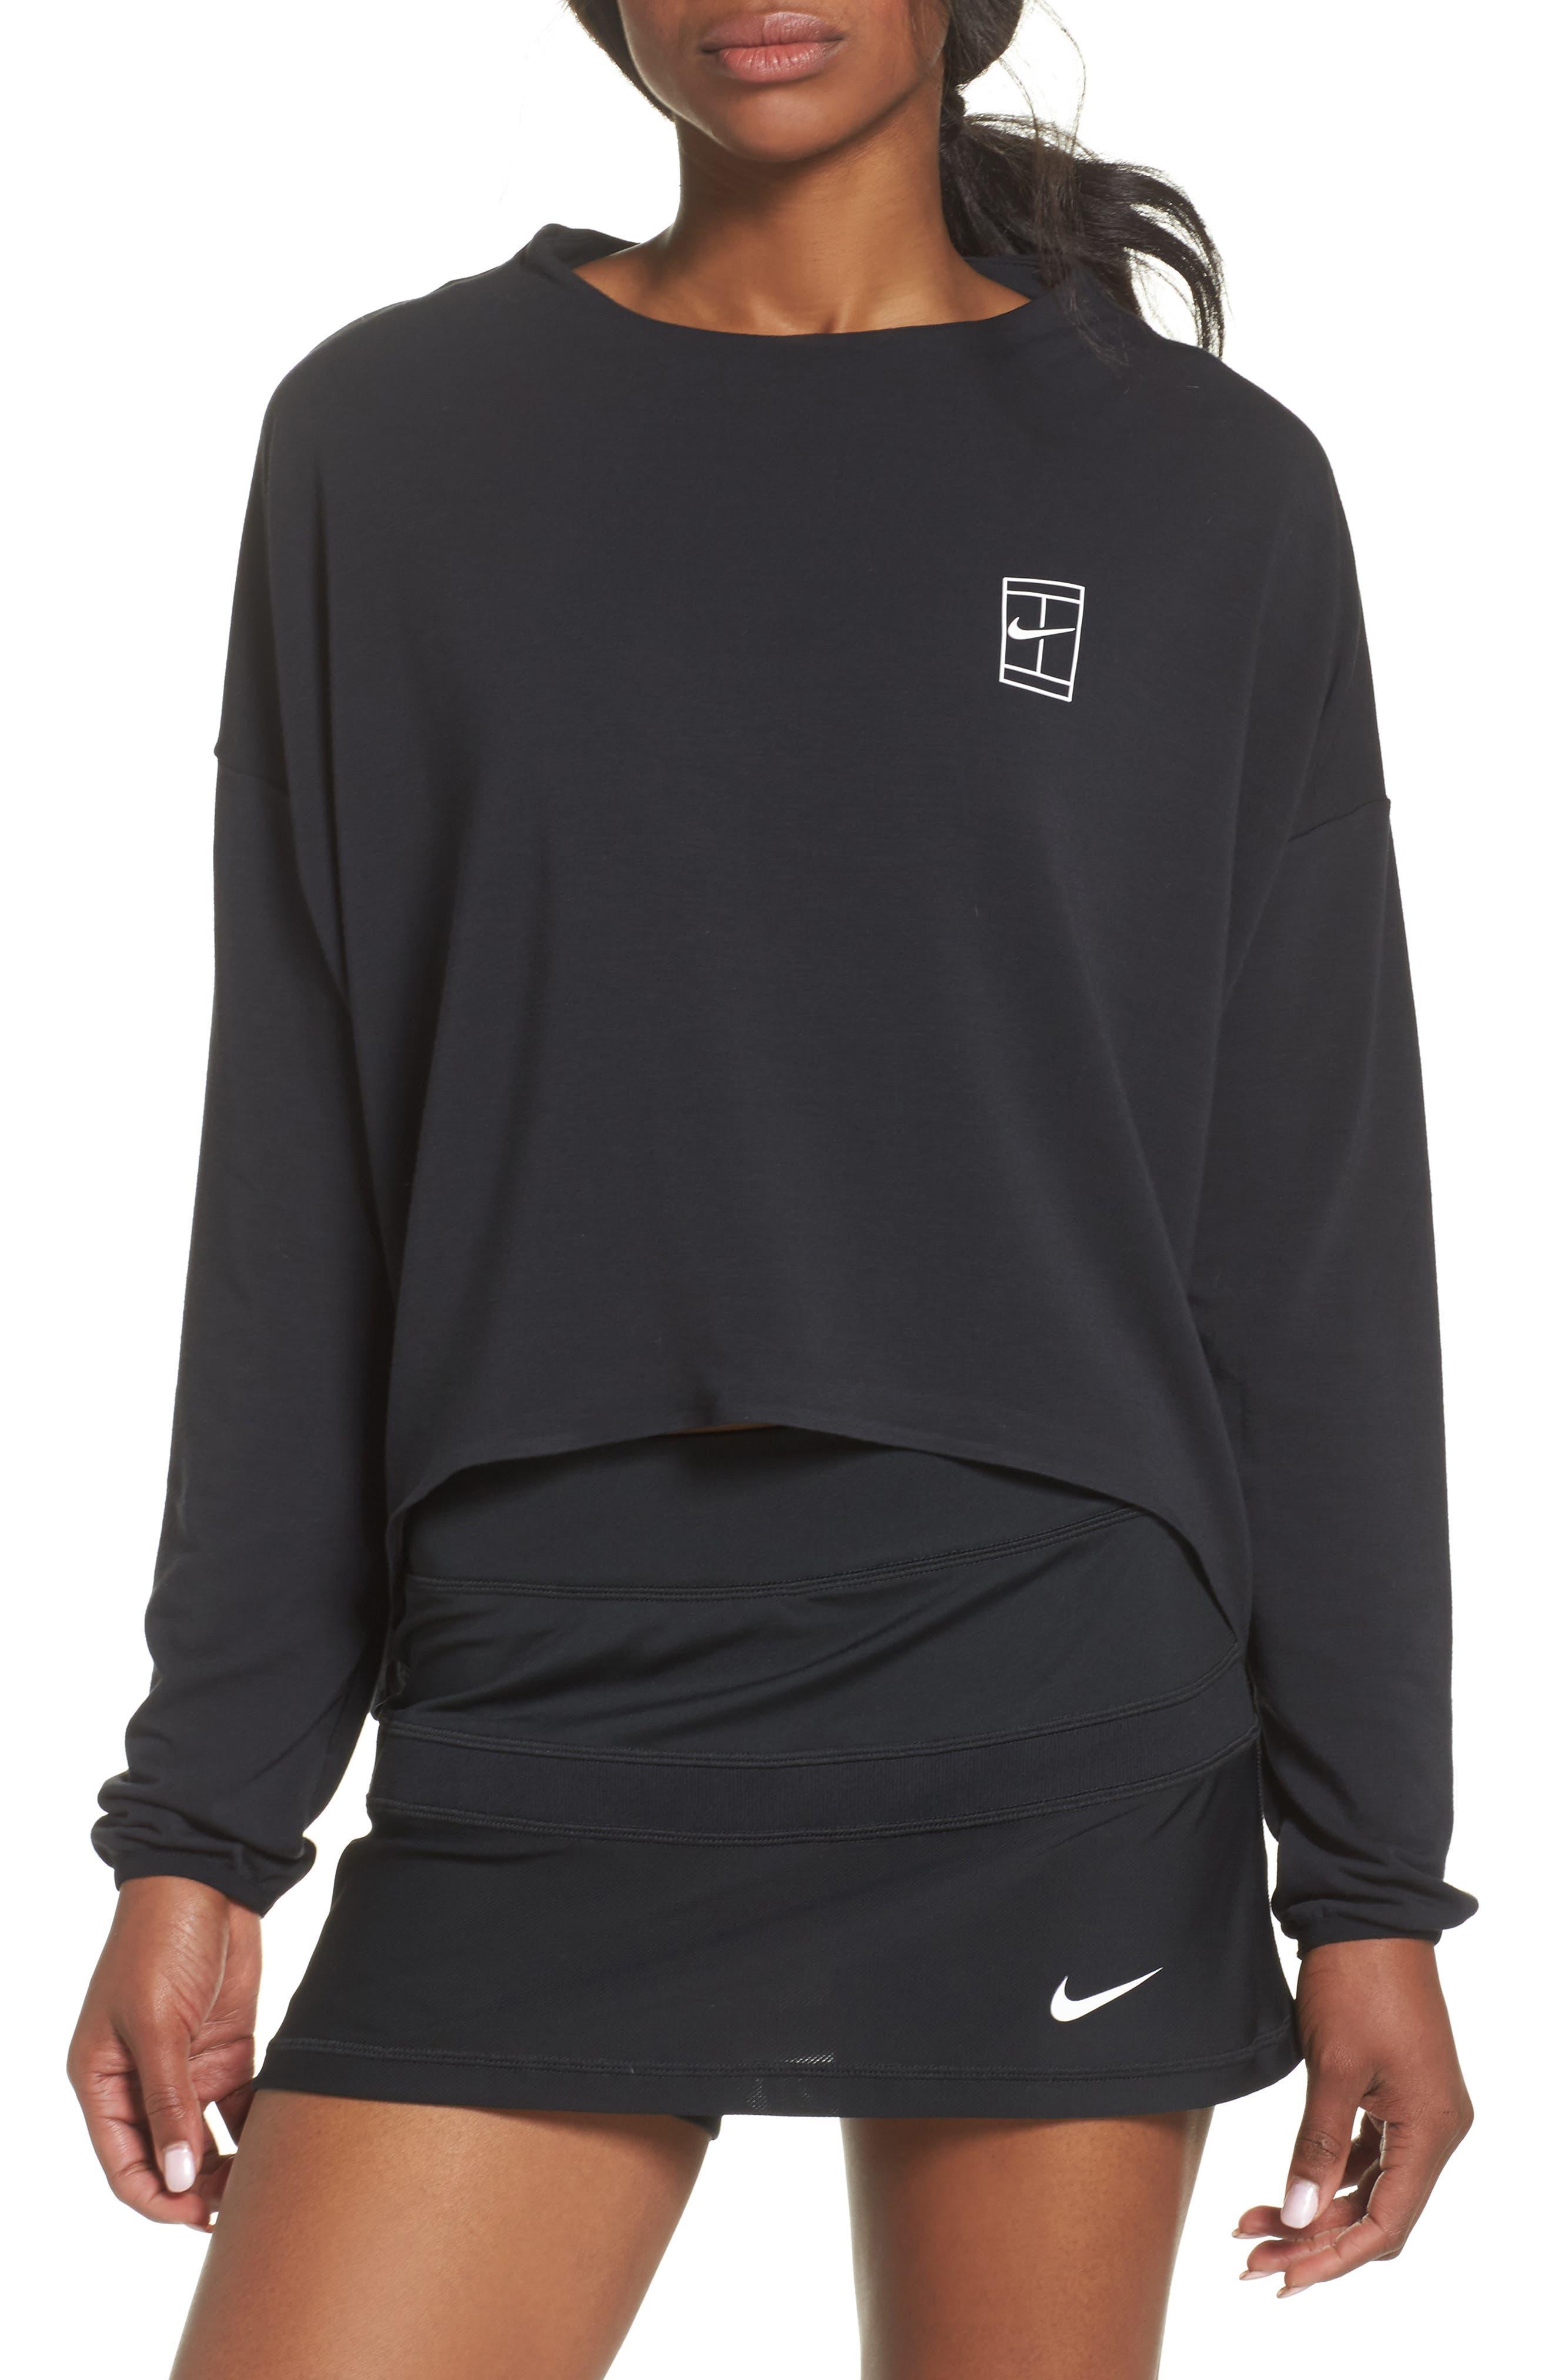 Court Dri-FIT Long Sleeve Tennis Top,                             Main thumbnail 1, color,                             Black/ White